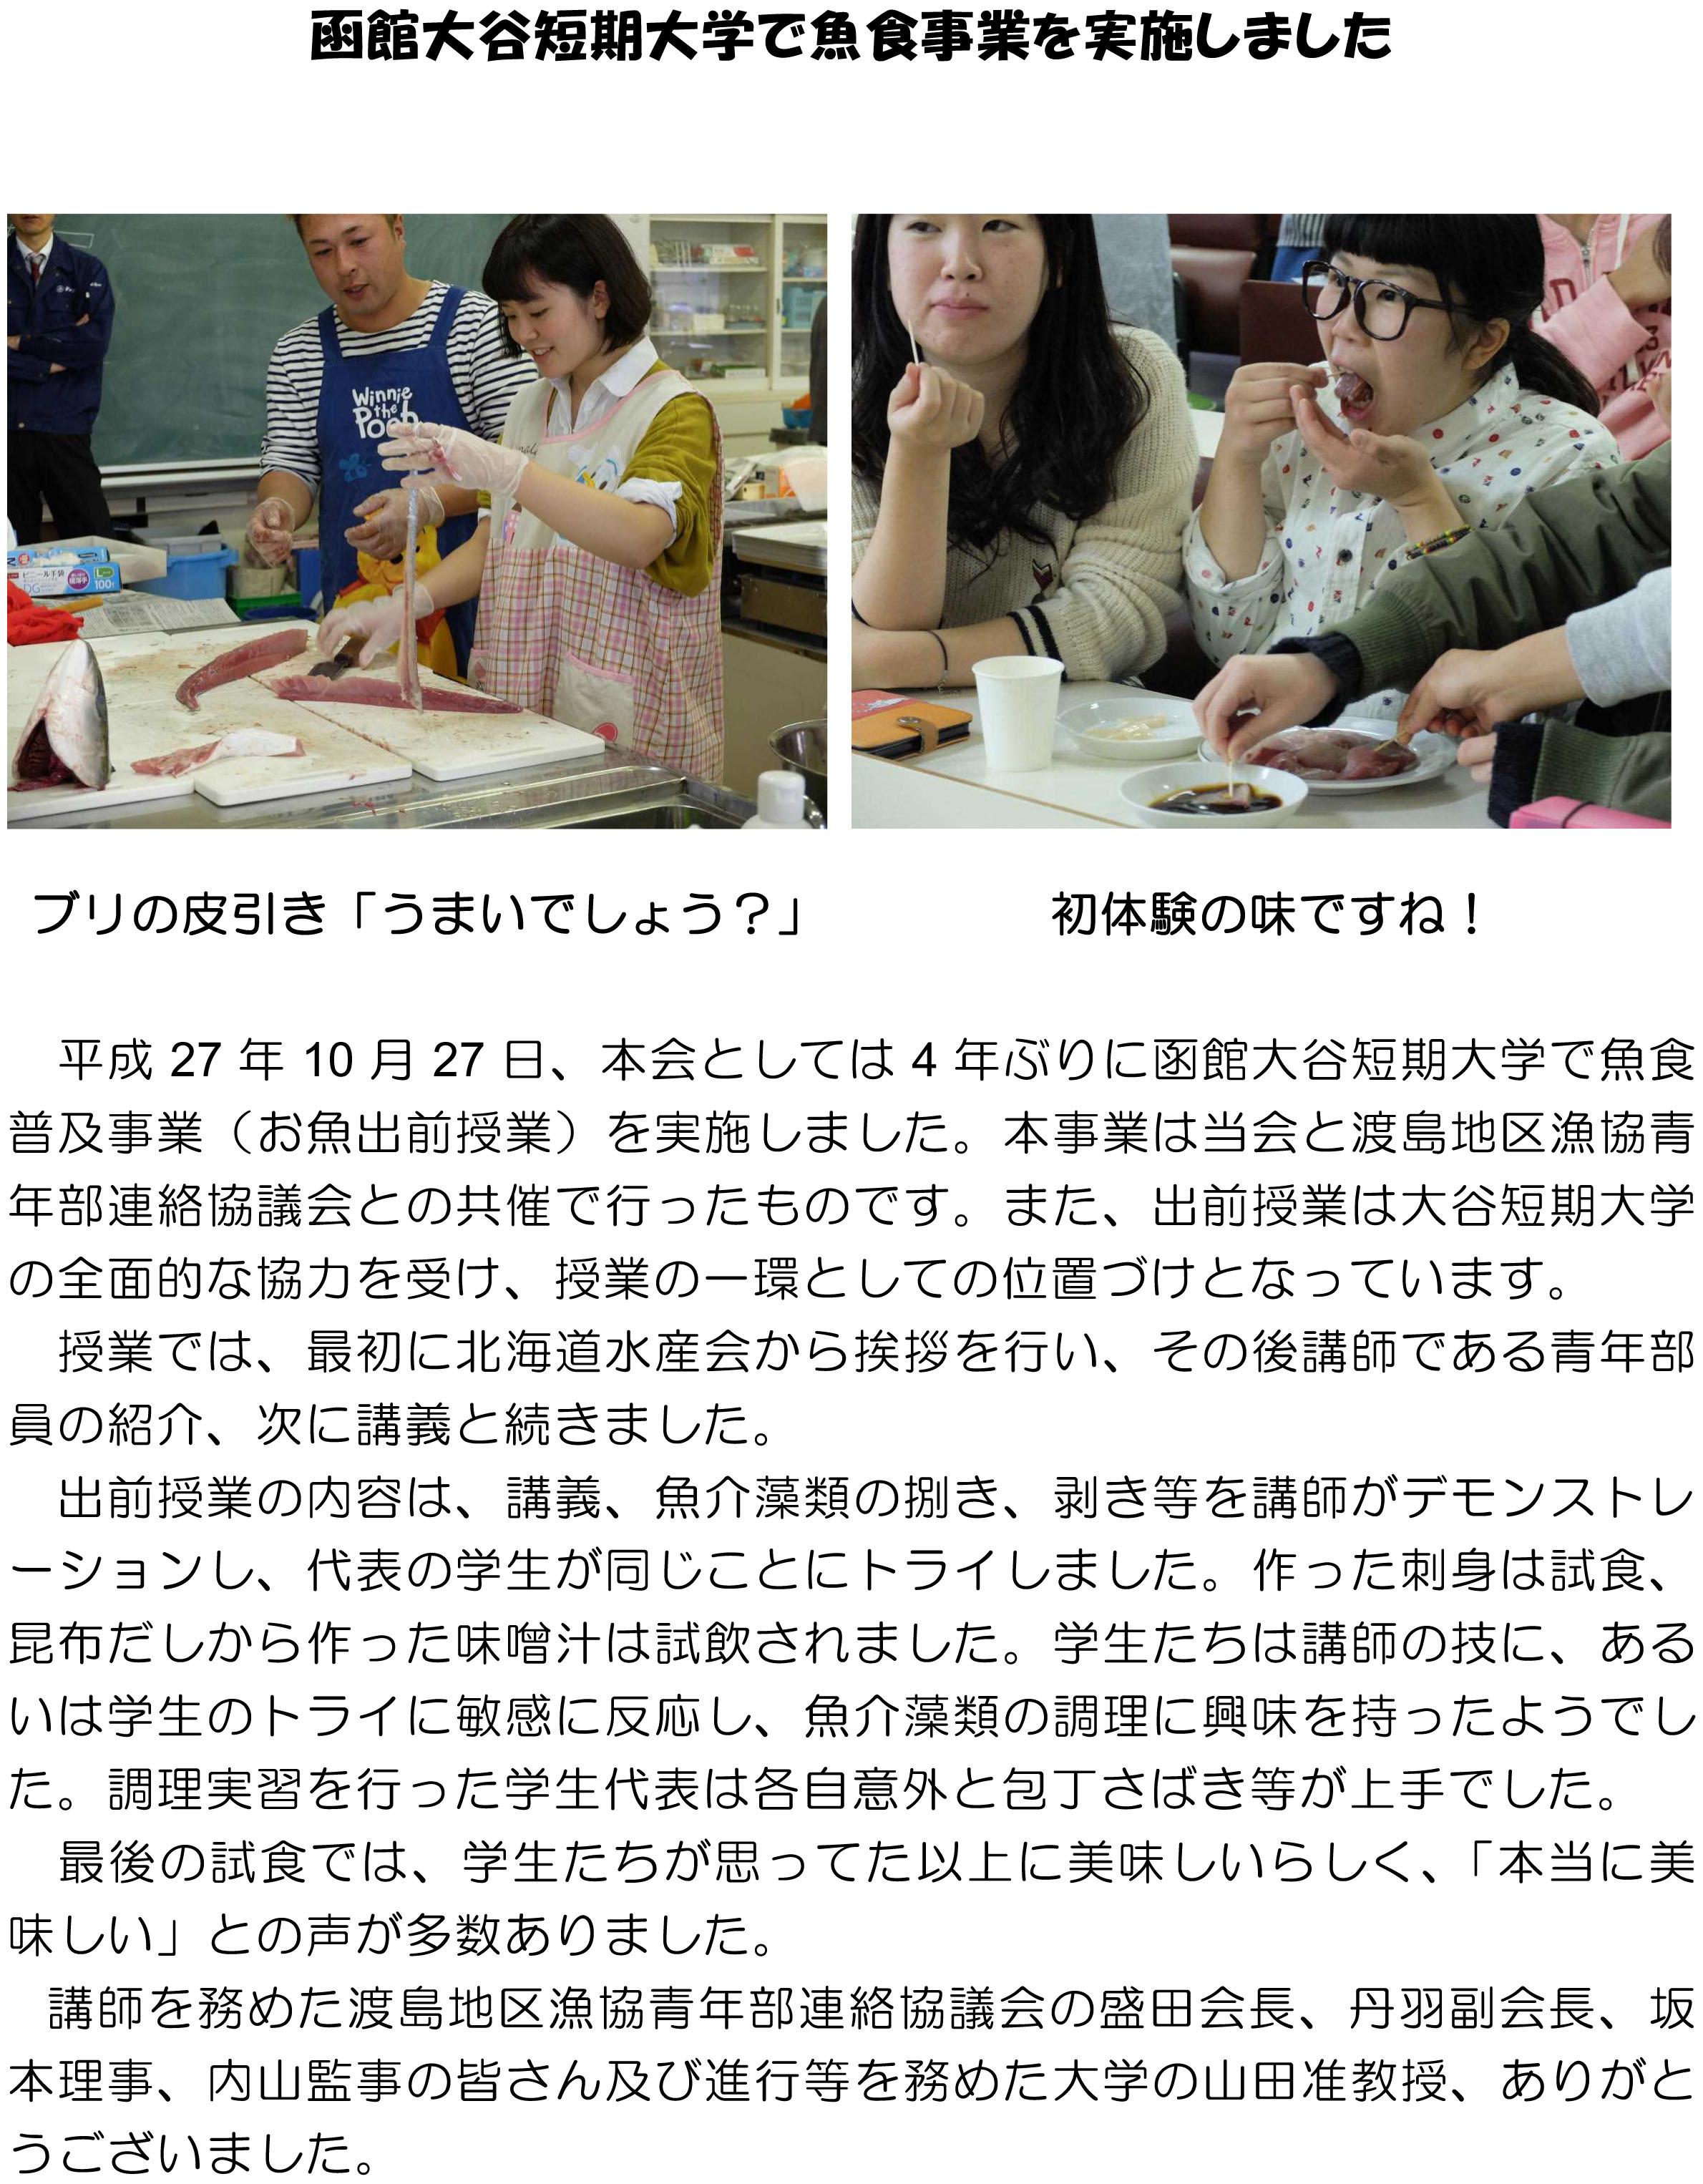 H27HP原稿(魚食、函館大谷)のコピー